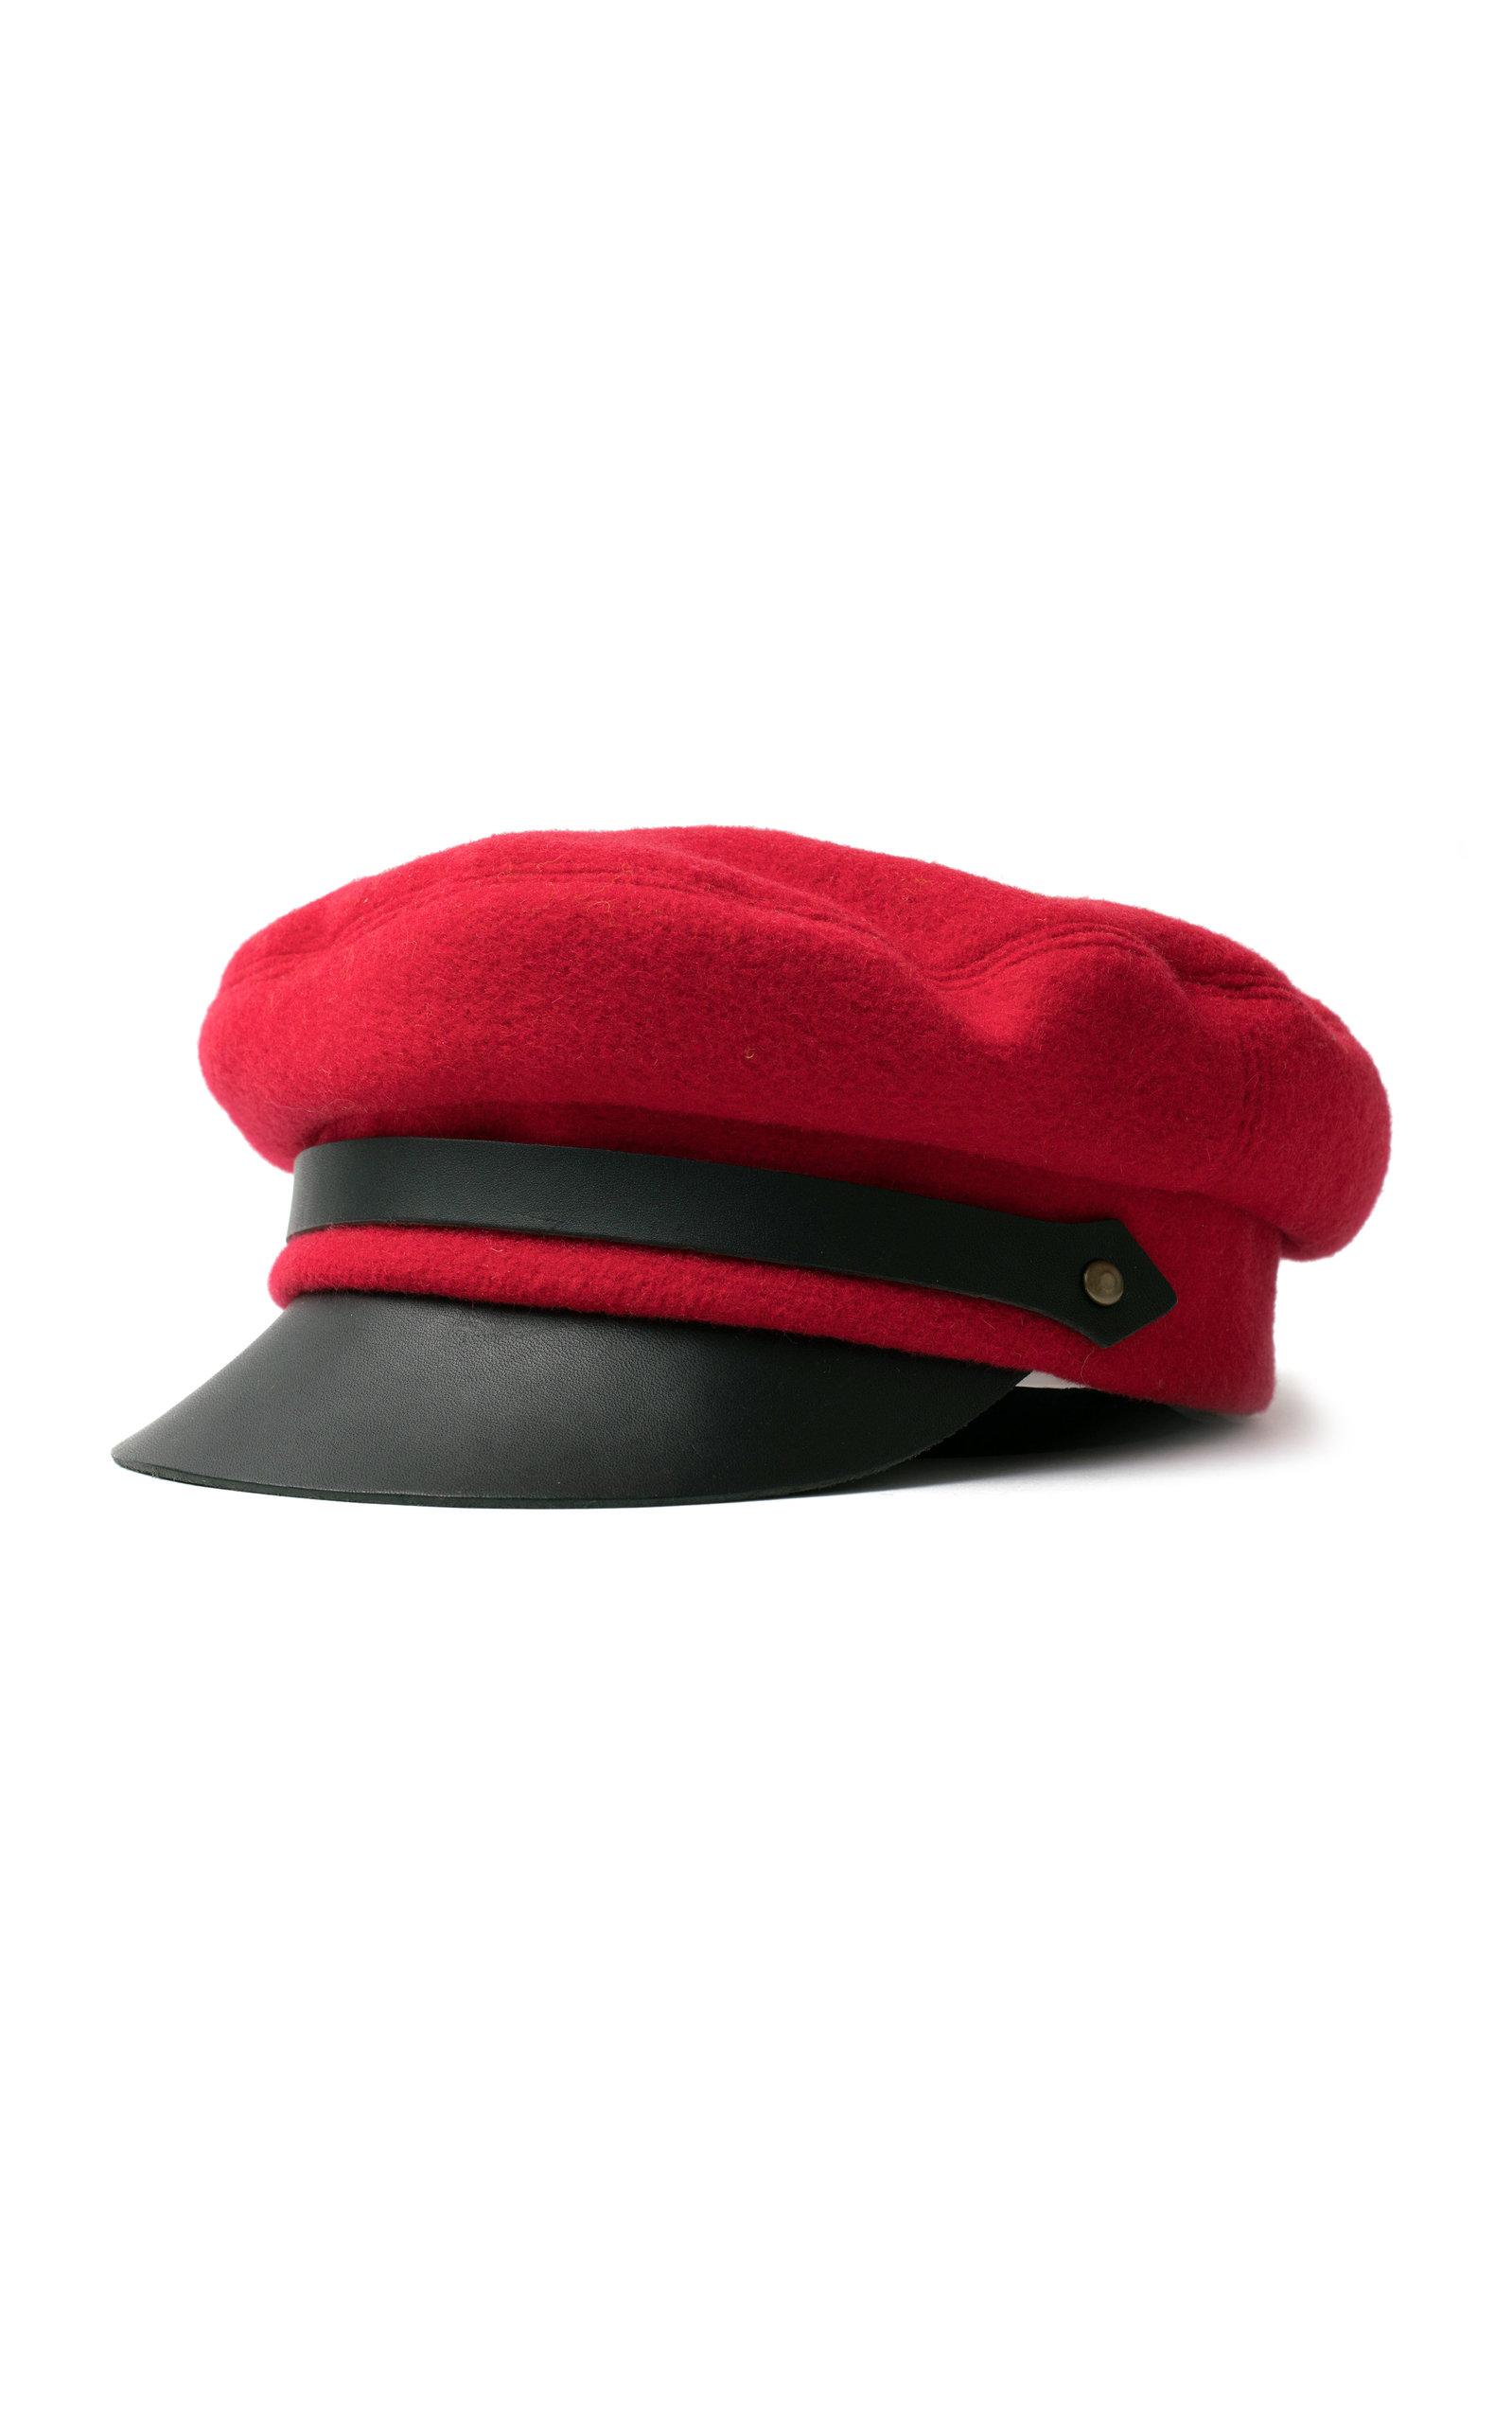 LOLA HATS CLASSIC CHAUFFEUR HAT